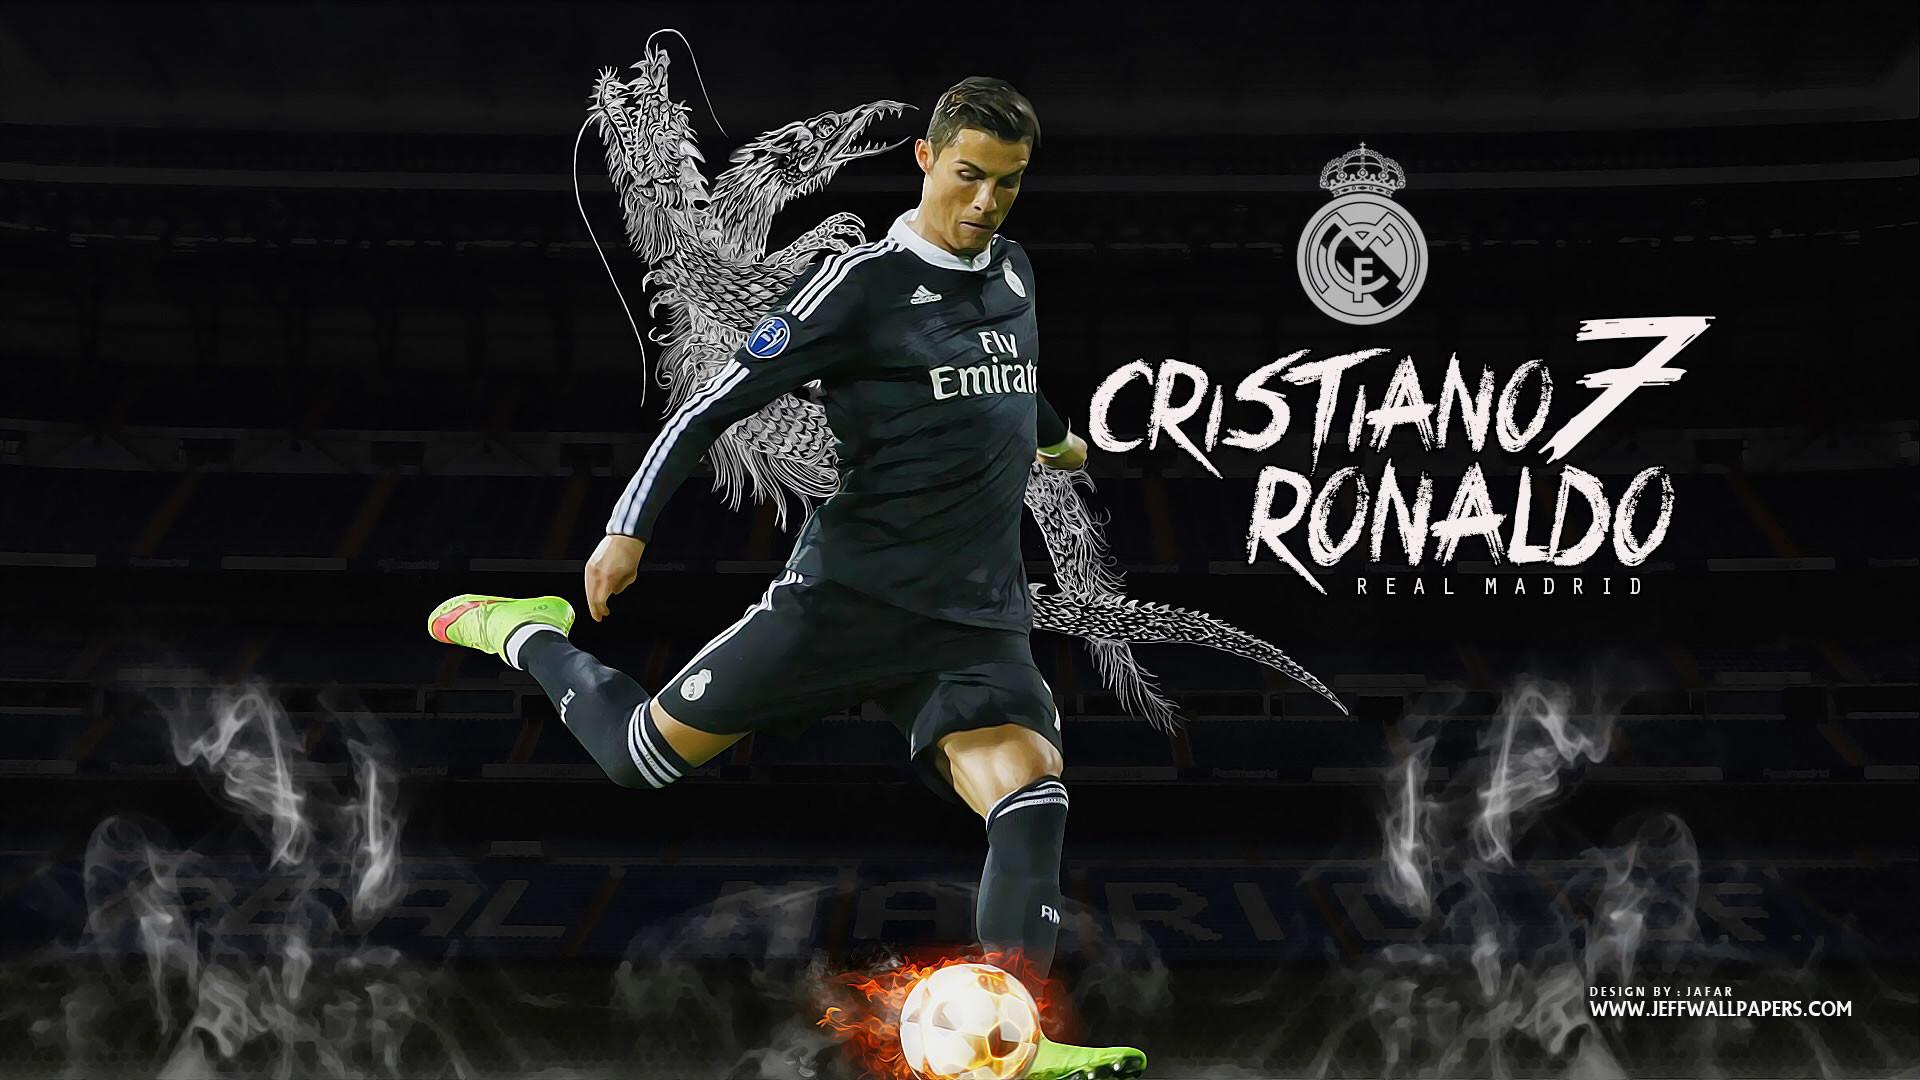 Ronaldo Real Madrid wallpaper by Jafarjeef – Cristiano Ronaldo .